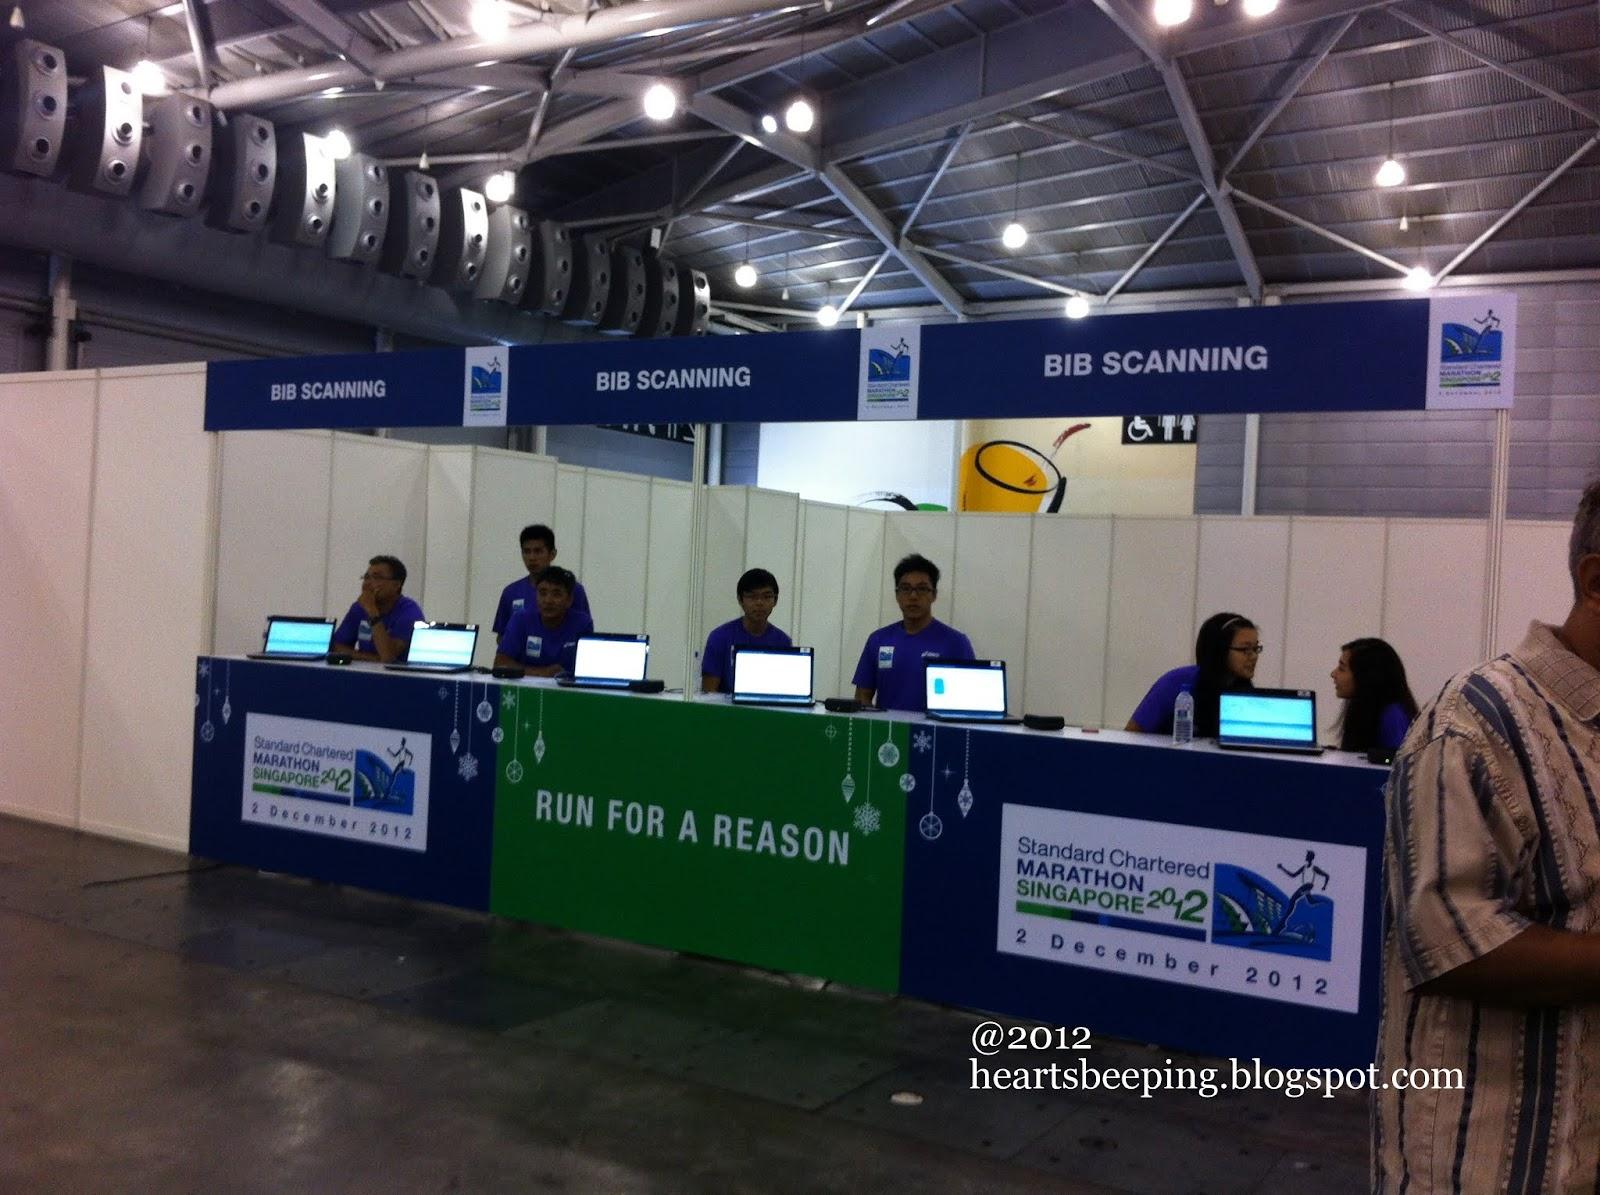 heartsbeeping standard chartered marathon singapore 2012